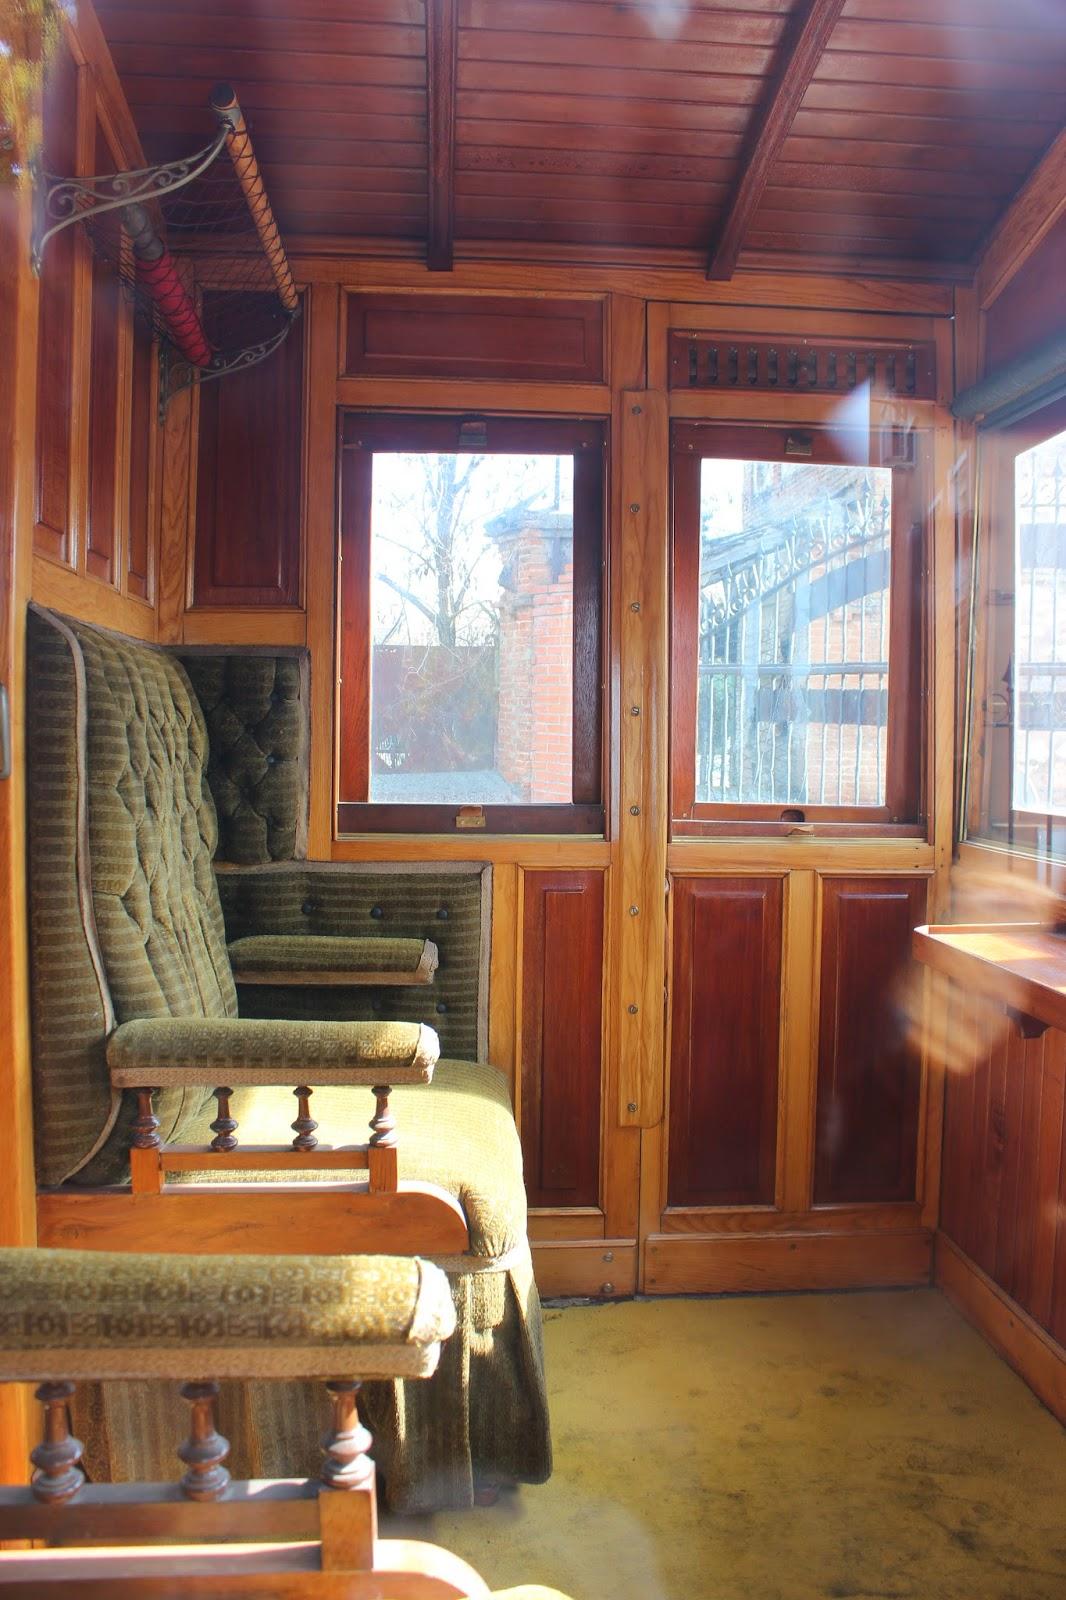 Interior de un tren de vapor. Tren de Arganda